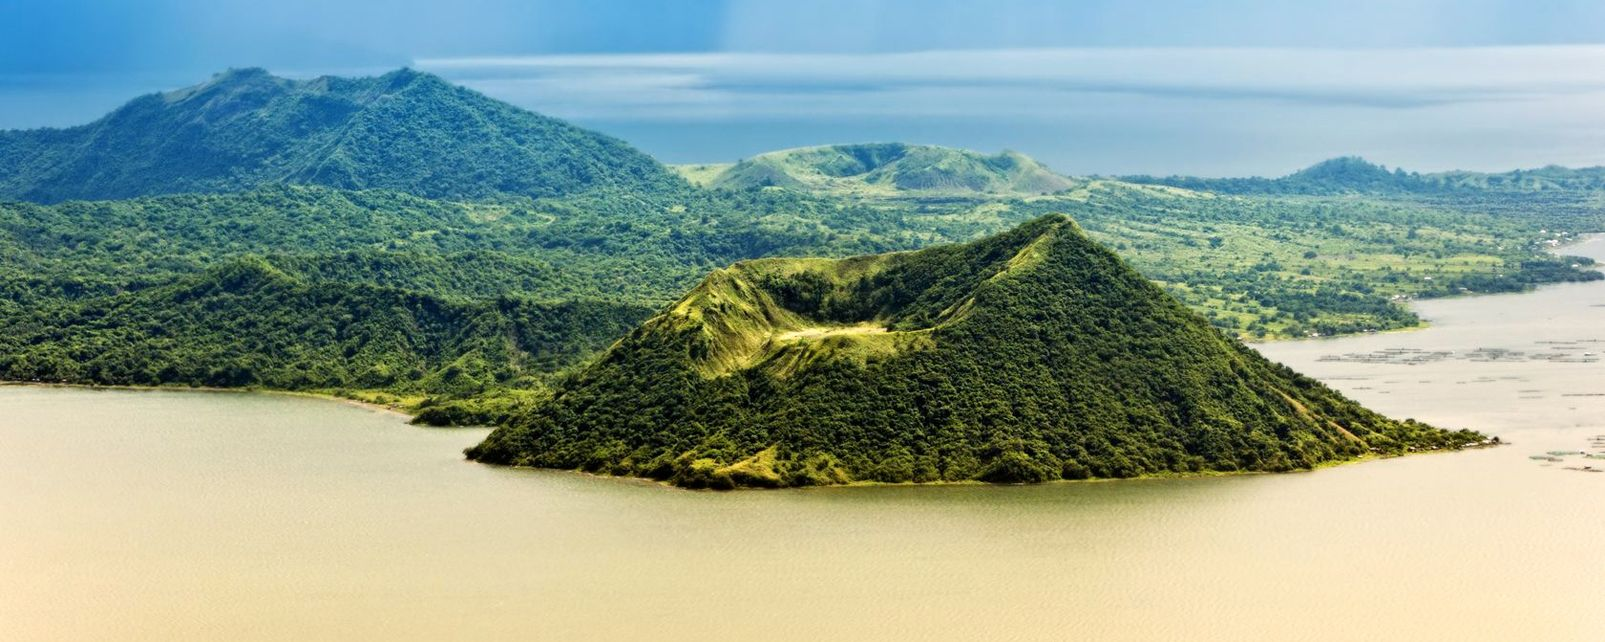 Les paysages, luzon, Philippines, volcan, taal, lac, lagune, batangas, bonbom